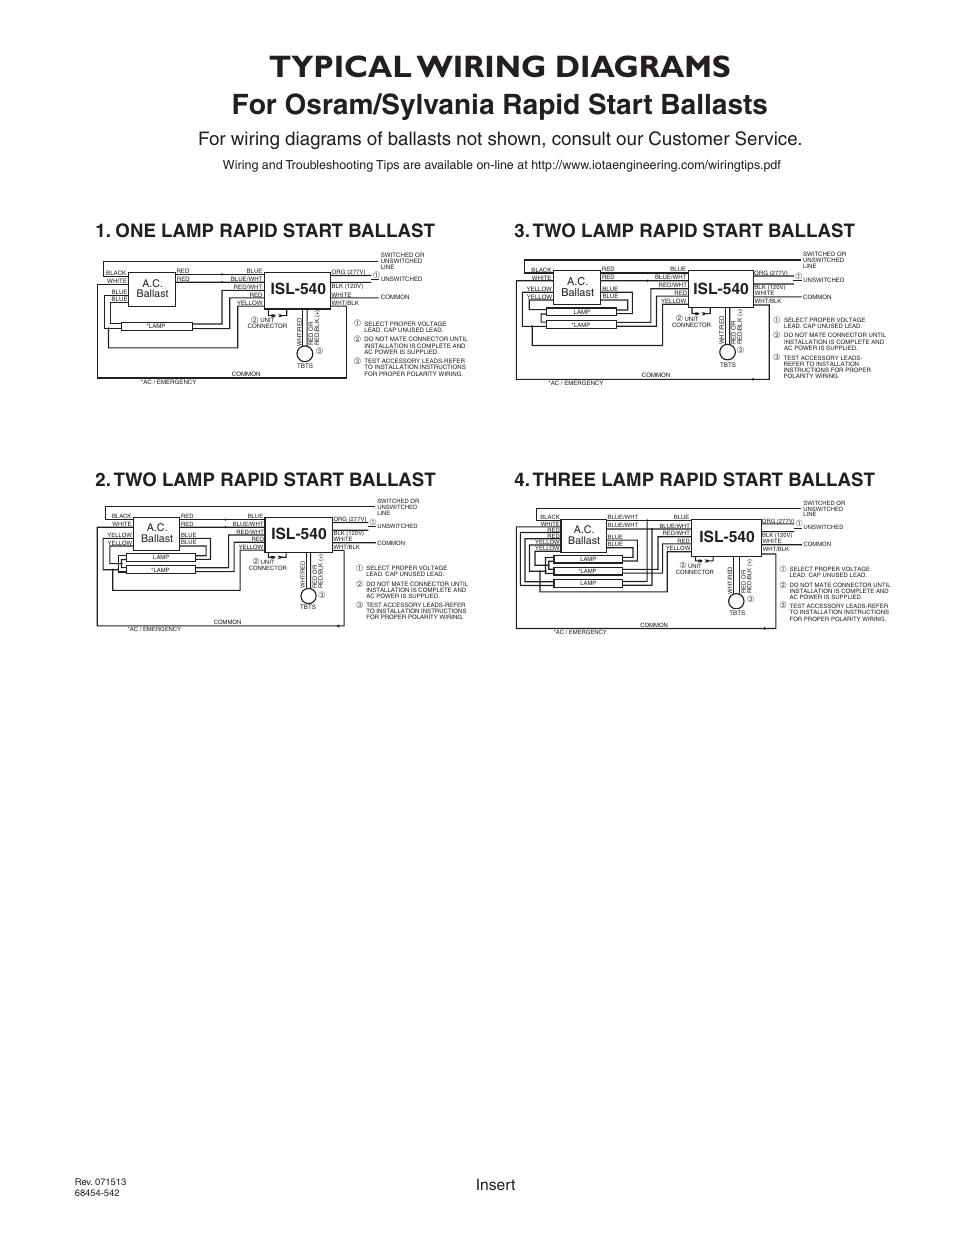 Bal3000 Em Ballast Wiring Diagram Diagrams Fluorescent Emergency Iota 1 Lamp I 162 Electronic